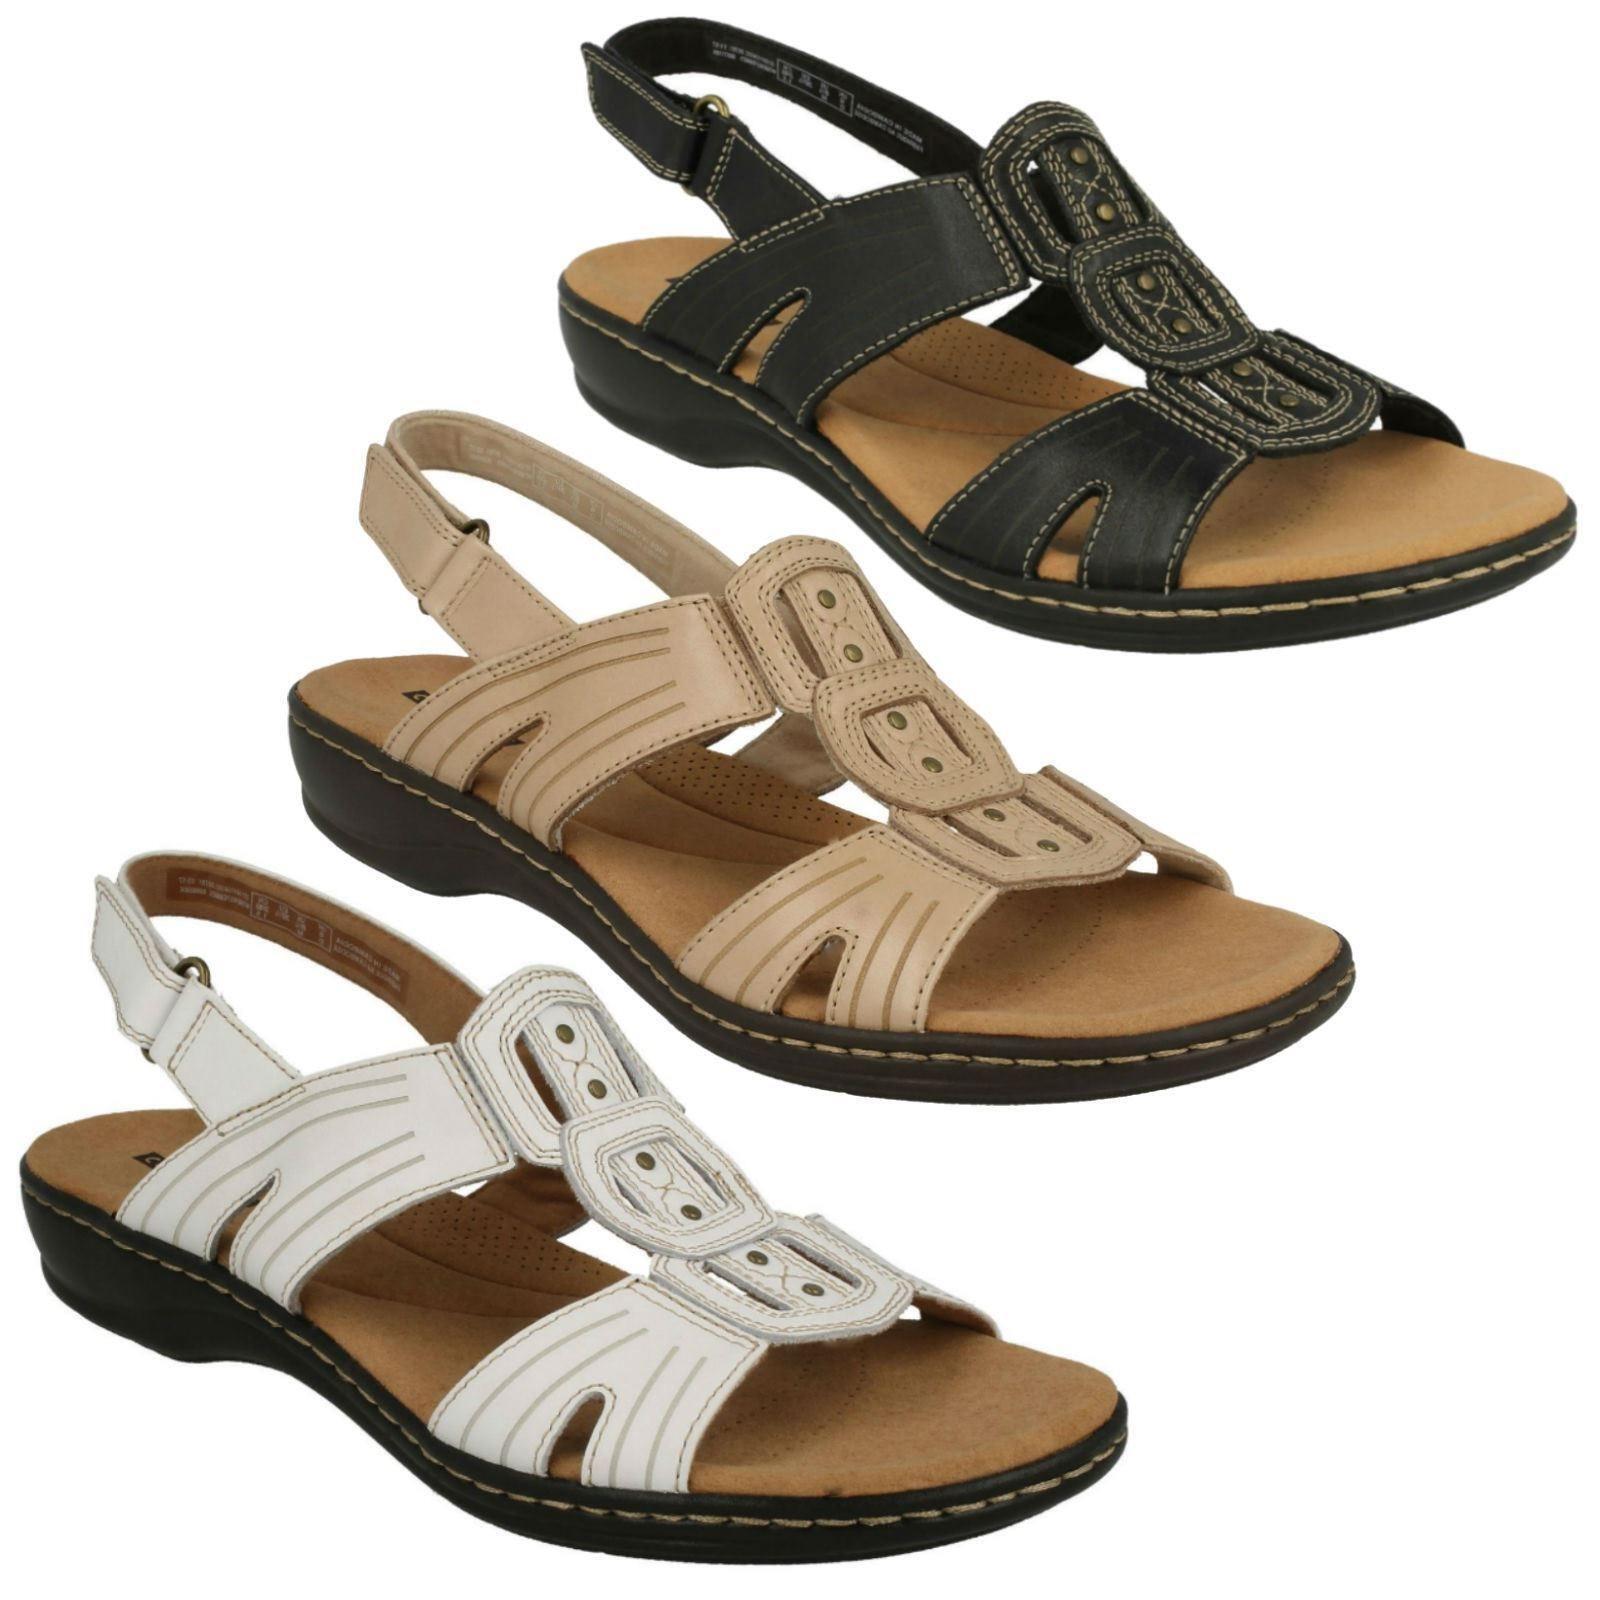 Damas Clarks 'Vid Cuero Charol Puntera Abierta Informal Sandalia Zapatos Talla